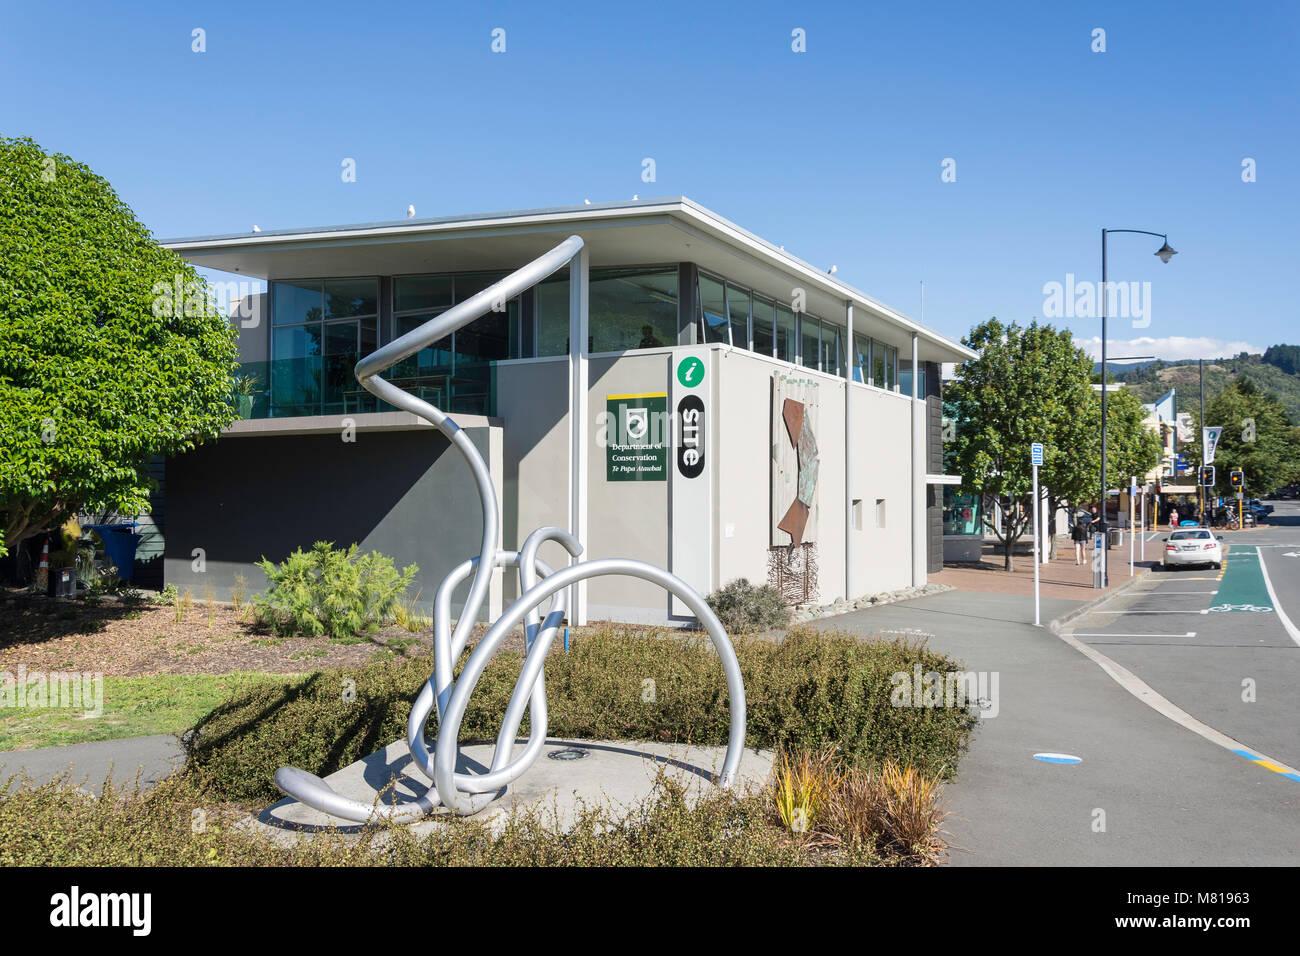 Nelson i-SITE Visitor Information Centre, Trafalgar Street, Nelson City, Nelson Region, New Zealand - Stock Image